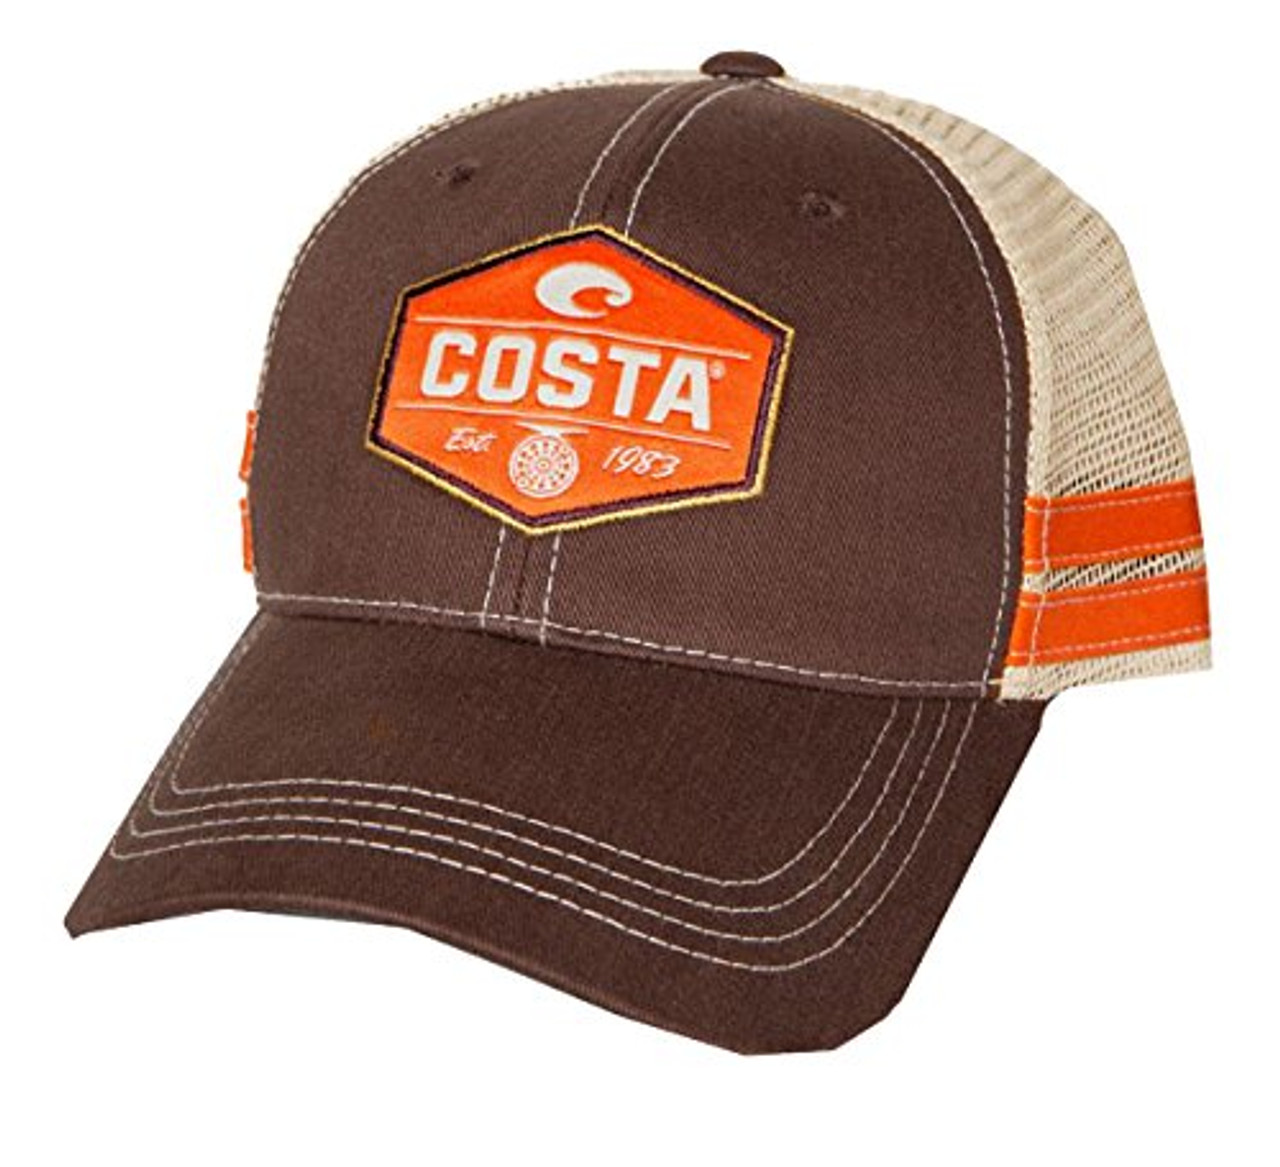 Costa Cutler Trucker Navy Hat